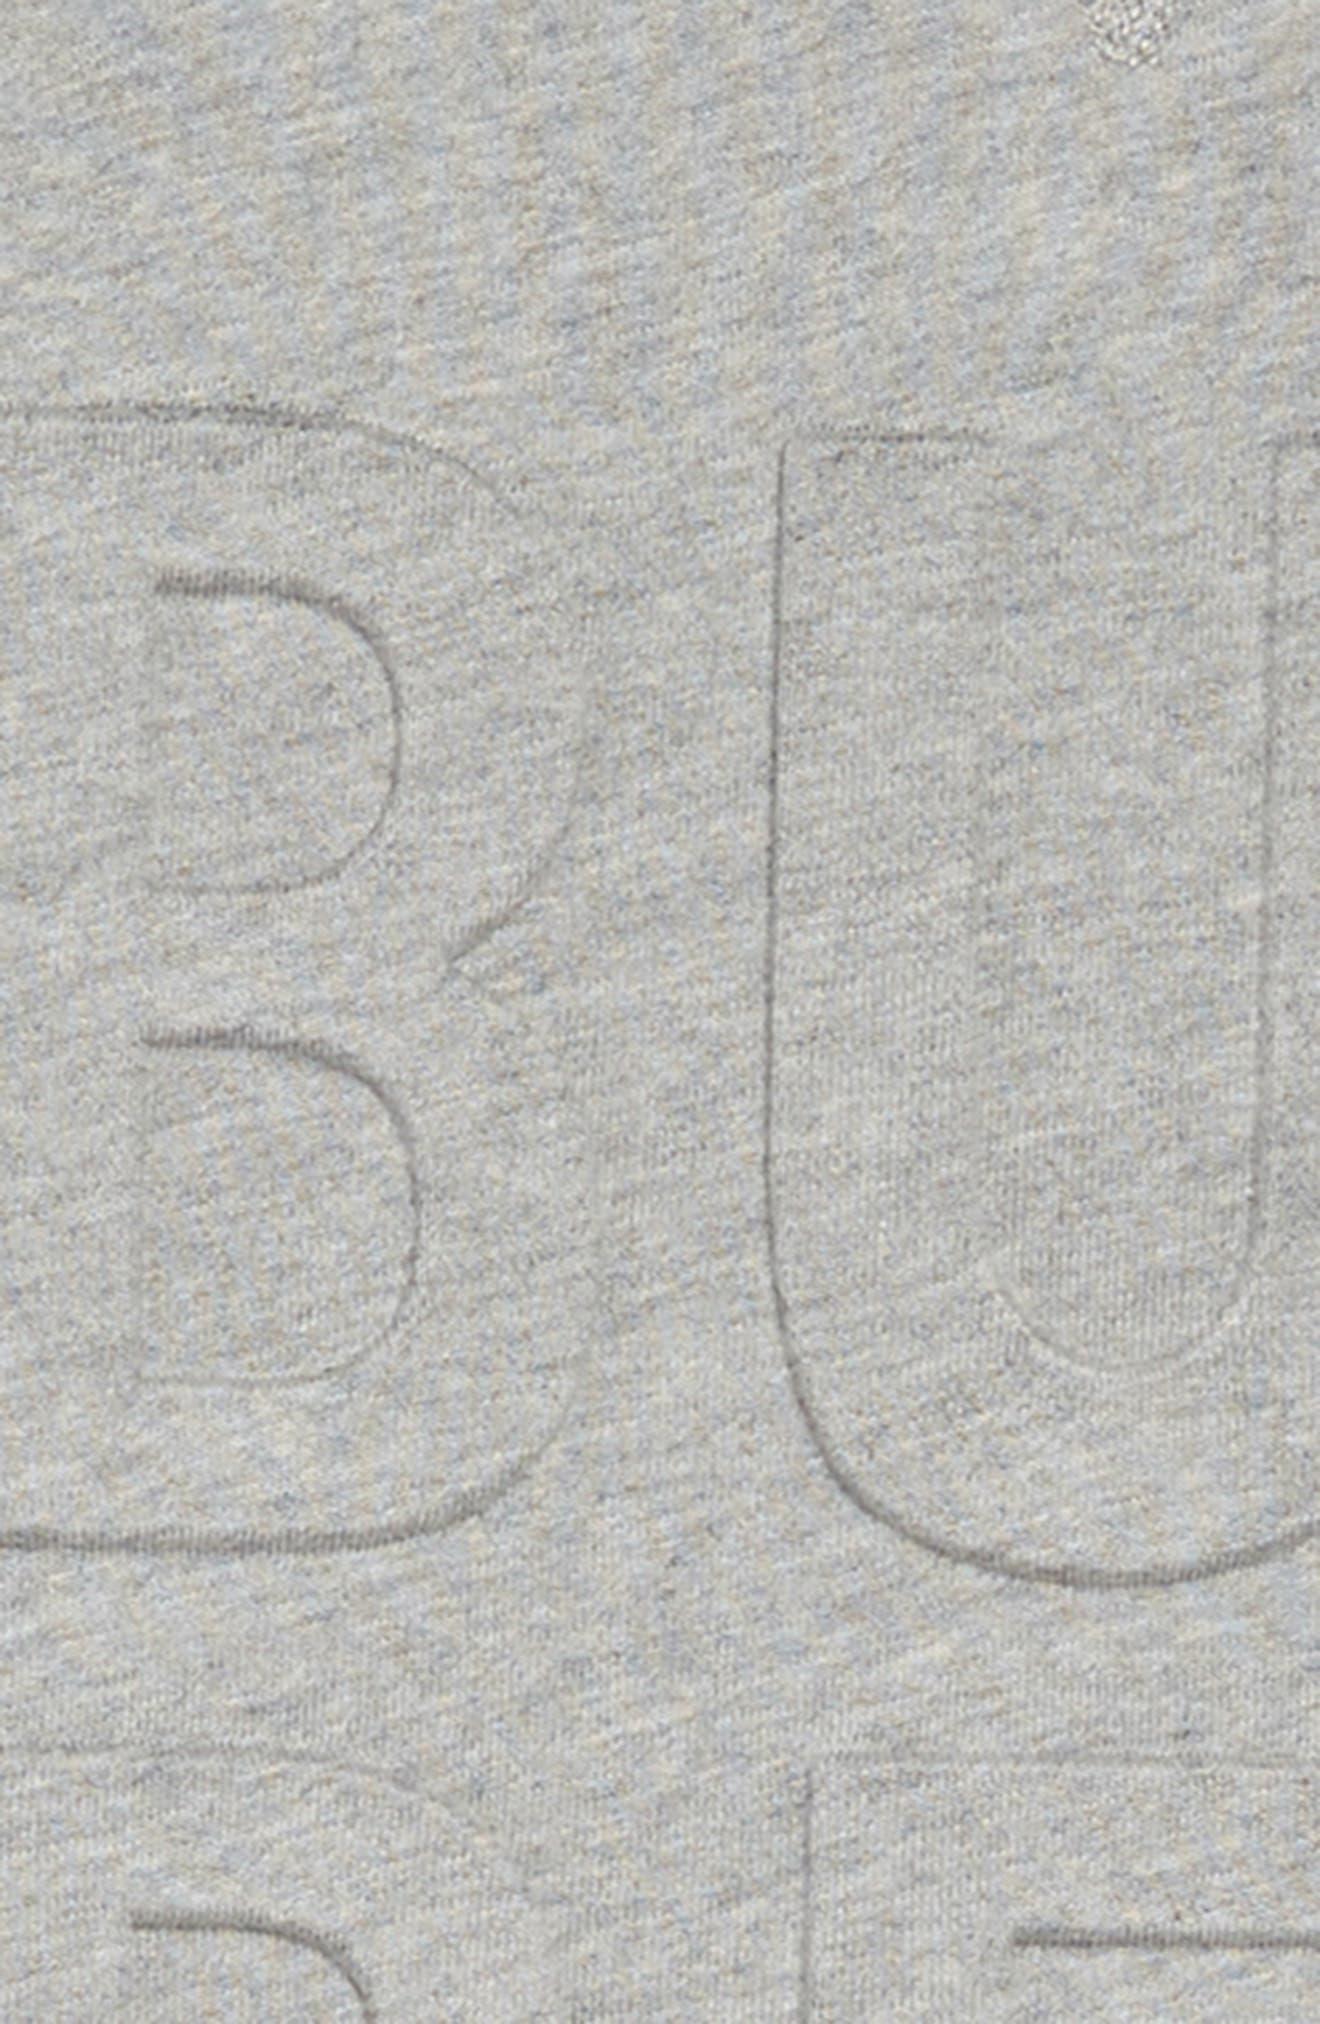 BURBERRY, Aurora Logo Sweatshirt Dress, Alternate thumbnail 3, color, GREY MELANGE